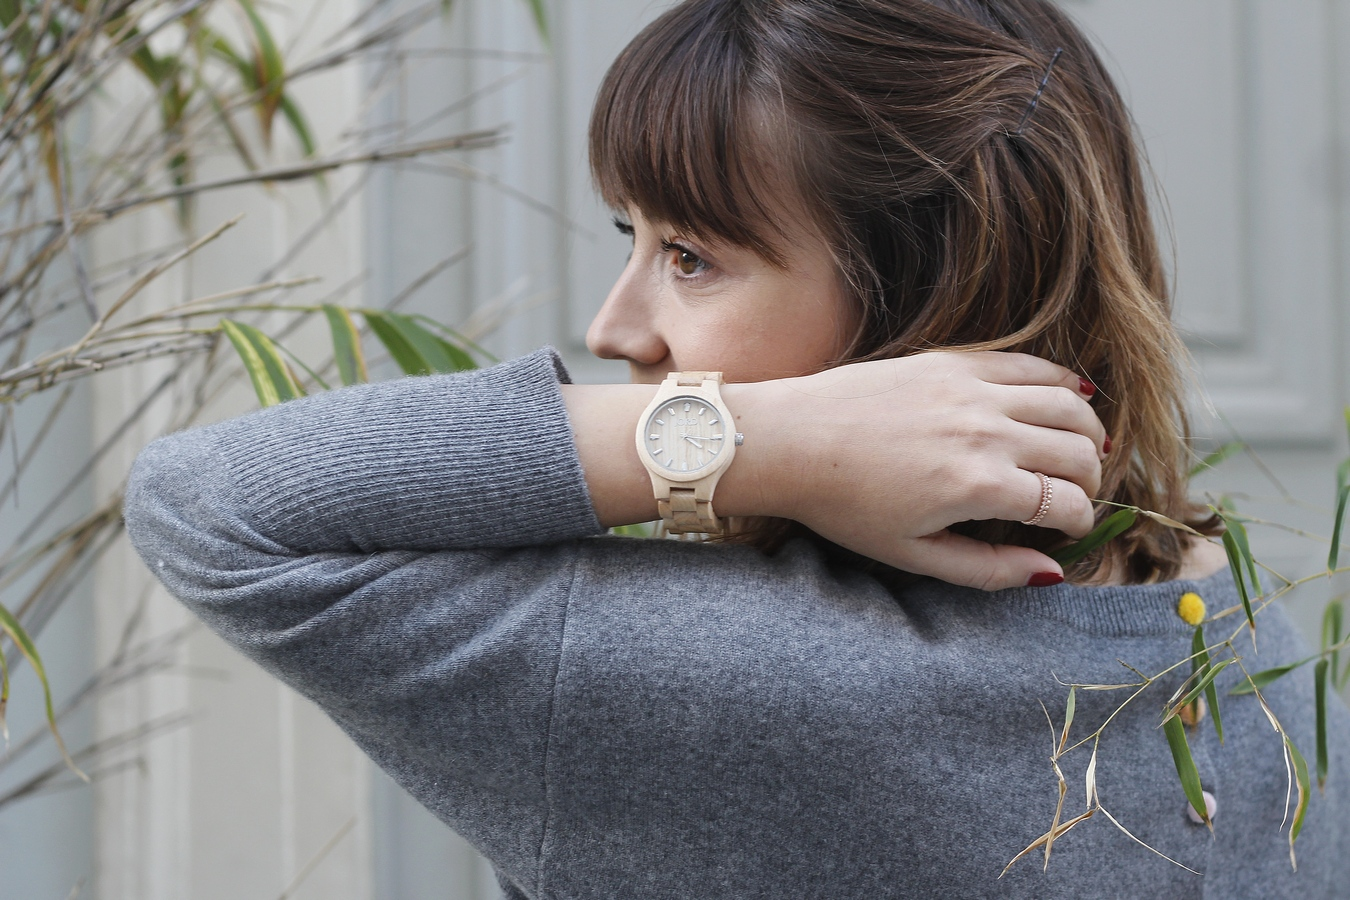 Blog mode femme Paris - Du style, Madame - streetstyle - estheme cachemire - jord watch